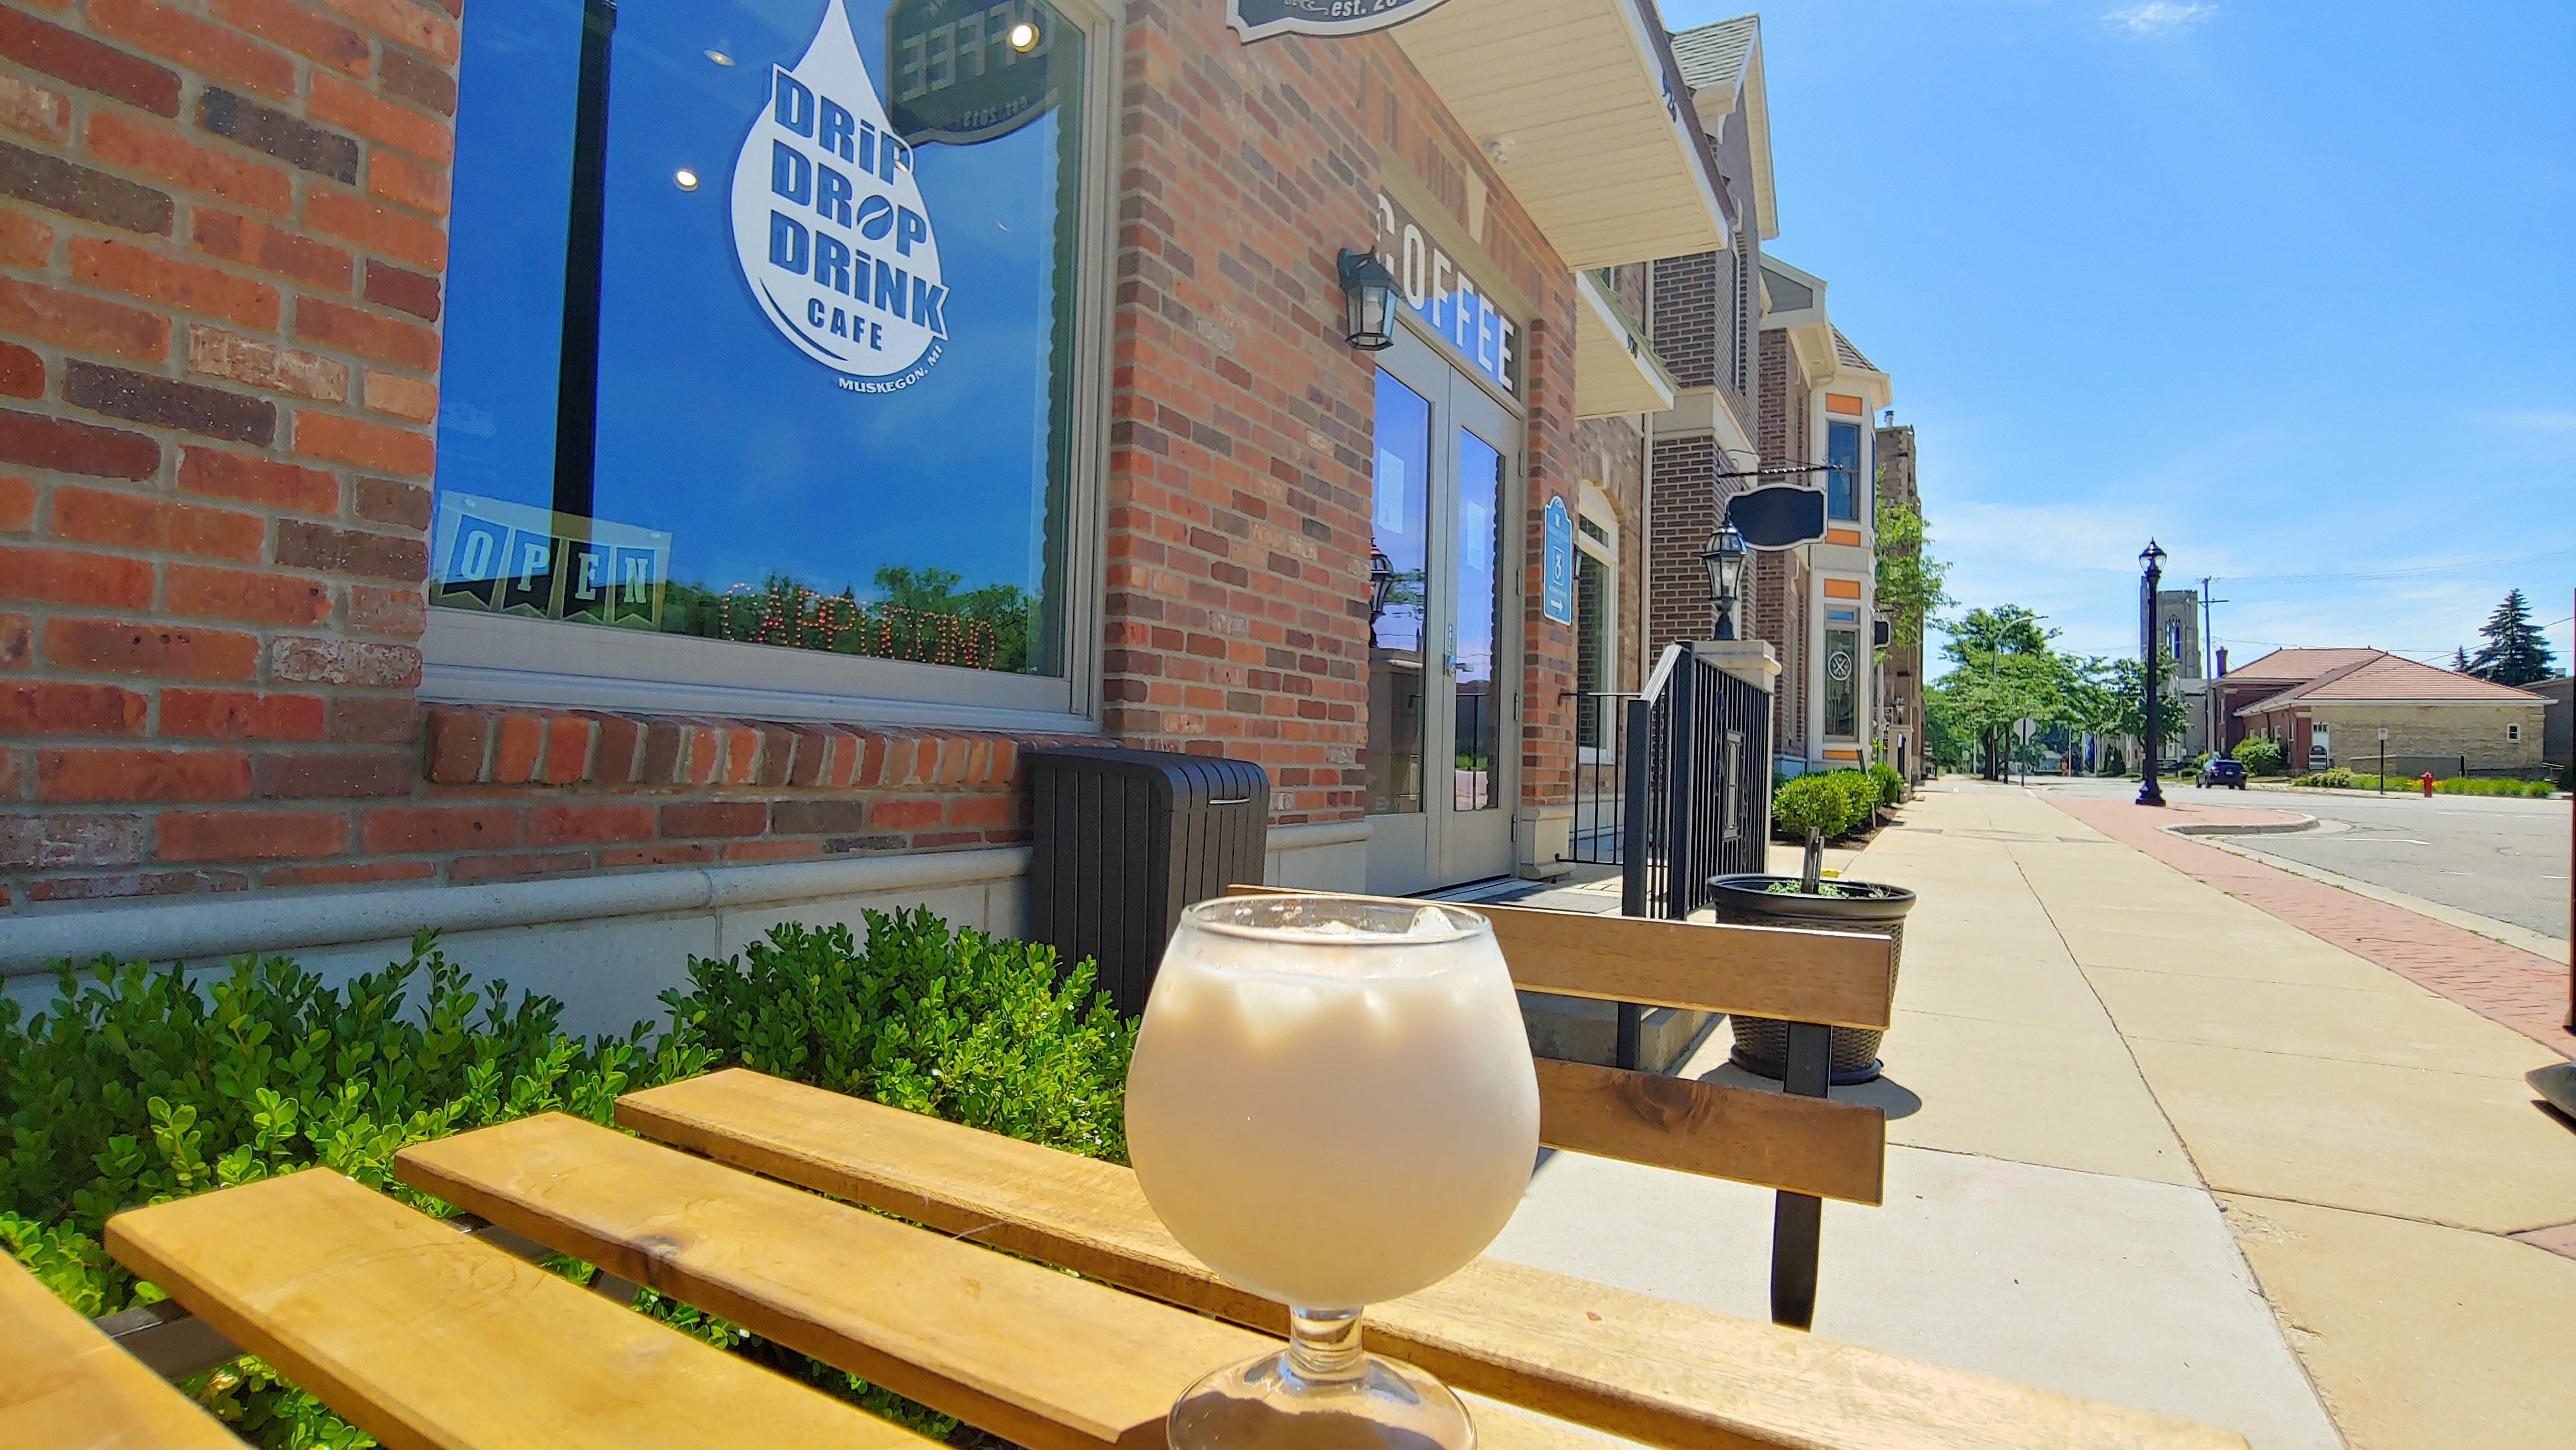 Best Coffee Shops in Downtown Muskegon